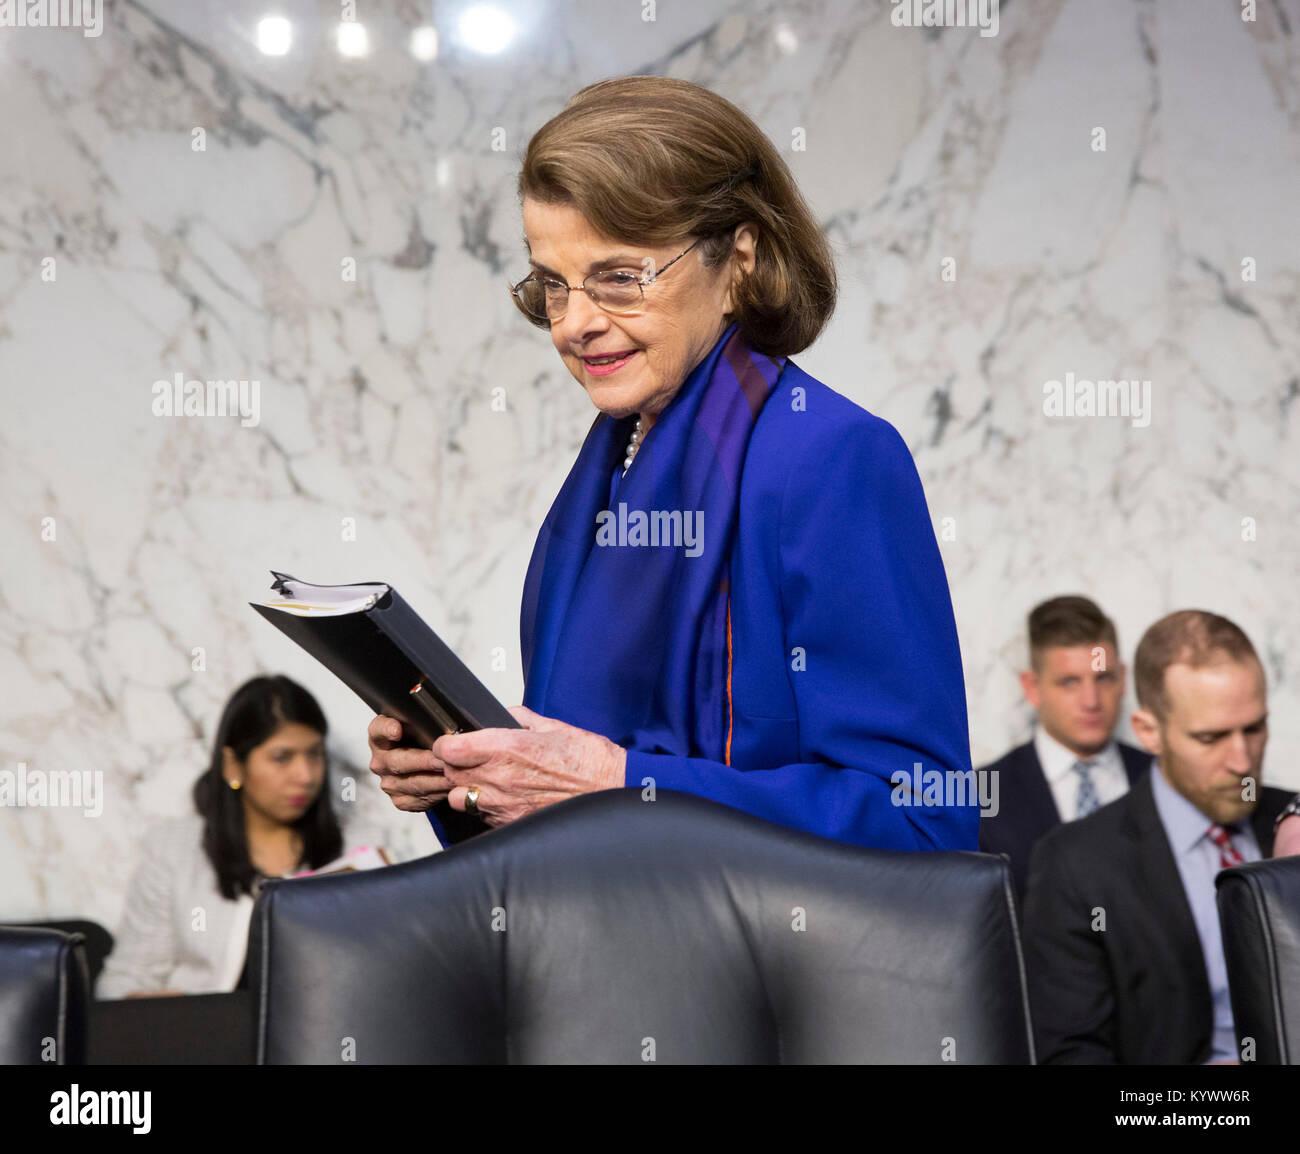 Washington, USA. 16th Jan, 2018. Senator Dianne Feinstein(D-CA) arrives for a hearing of the Senate Judiciary Committee - Stock Image